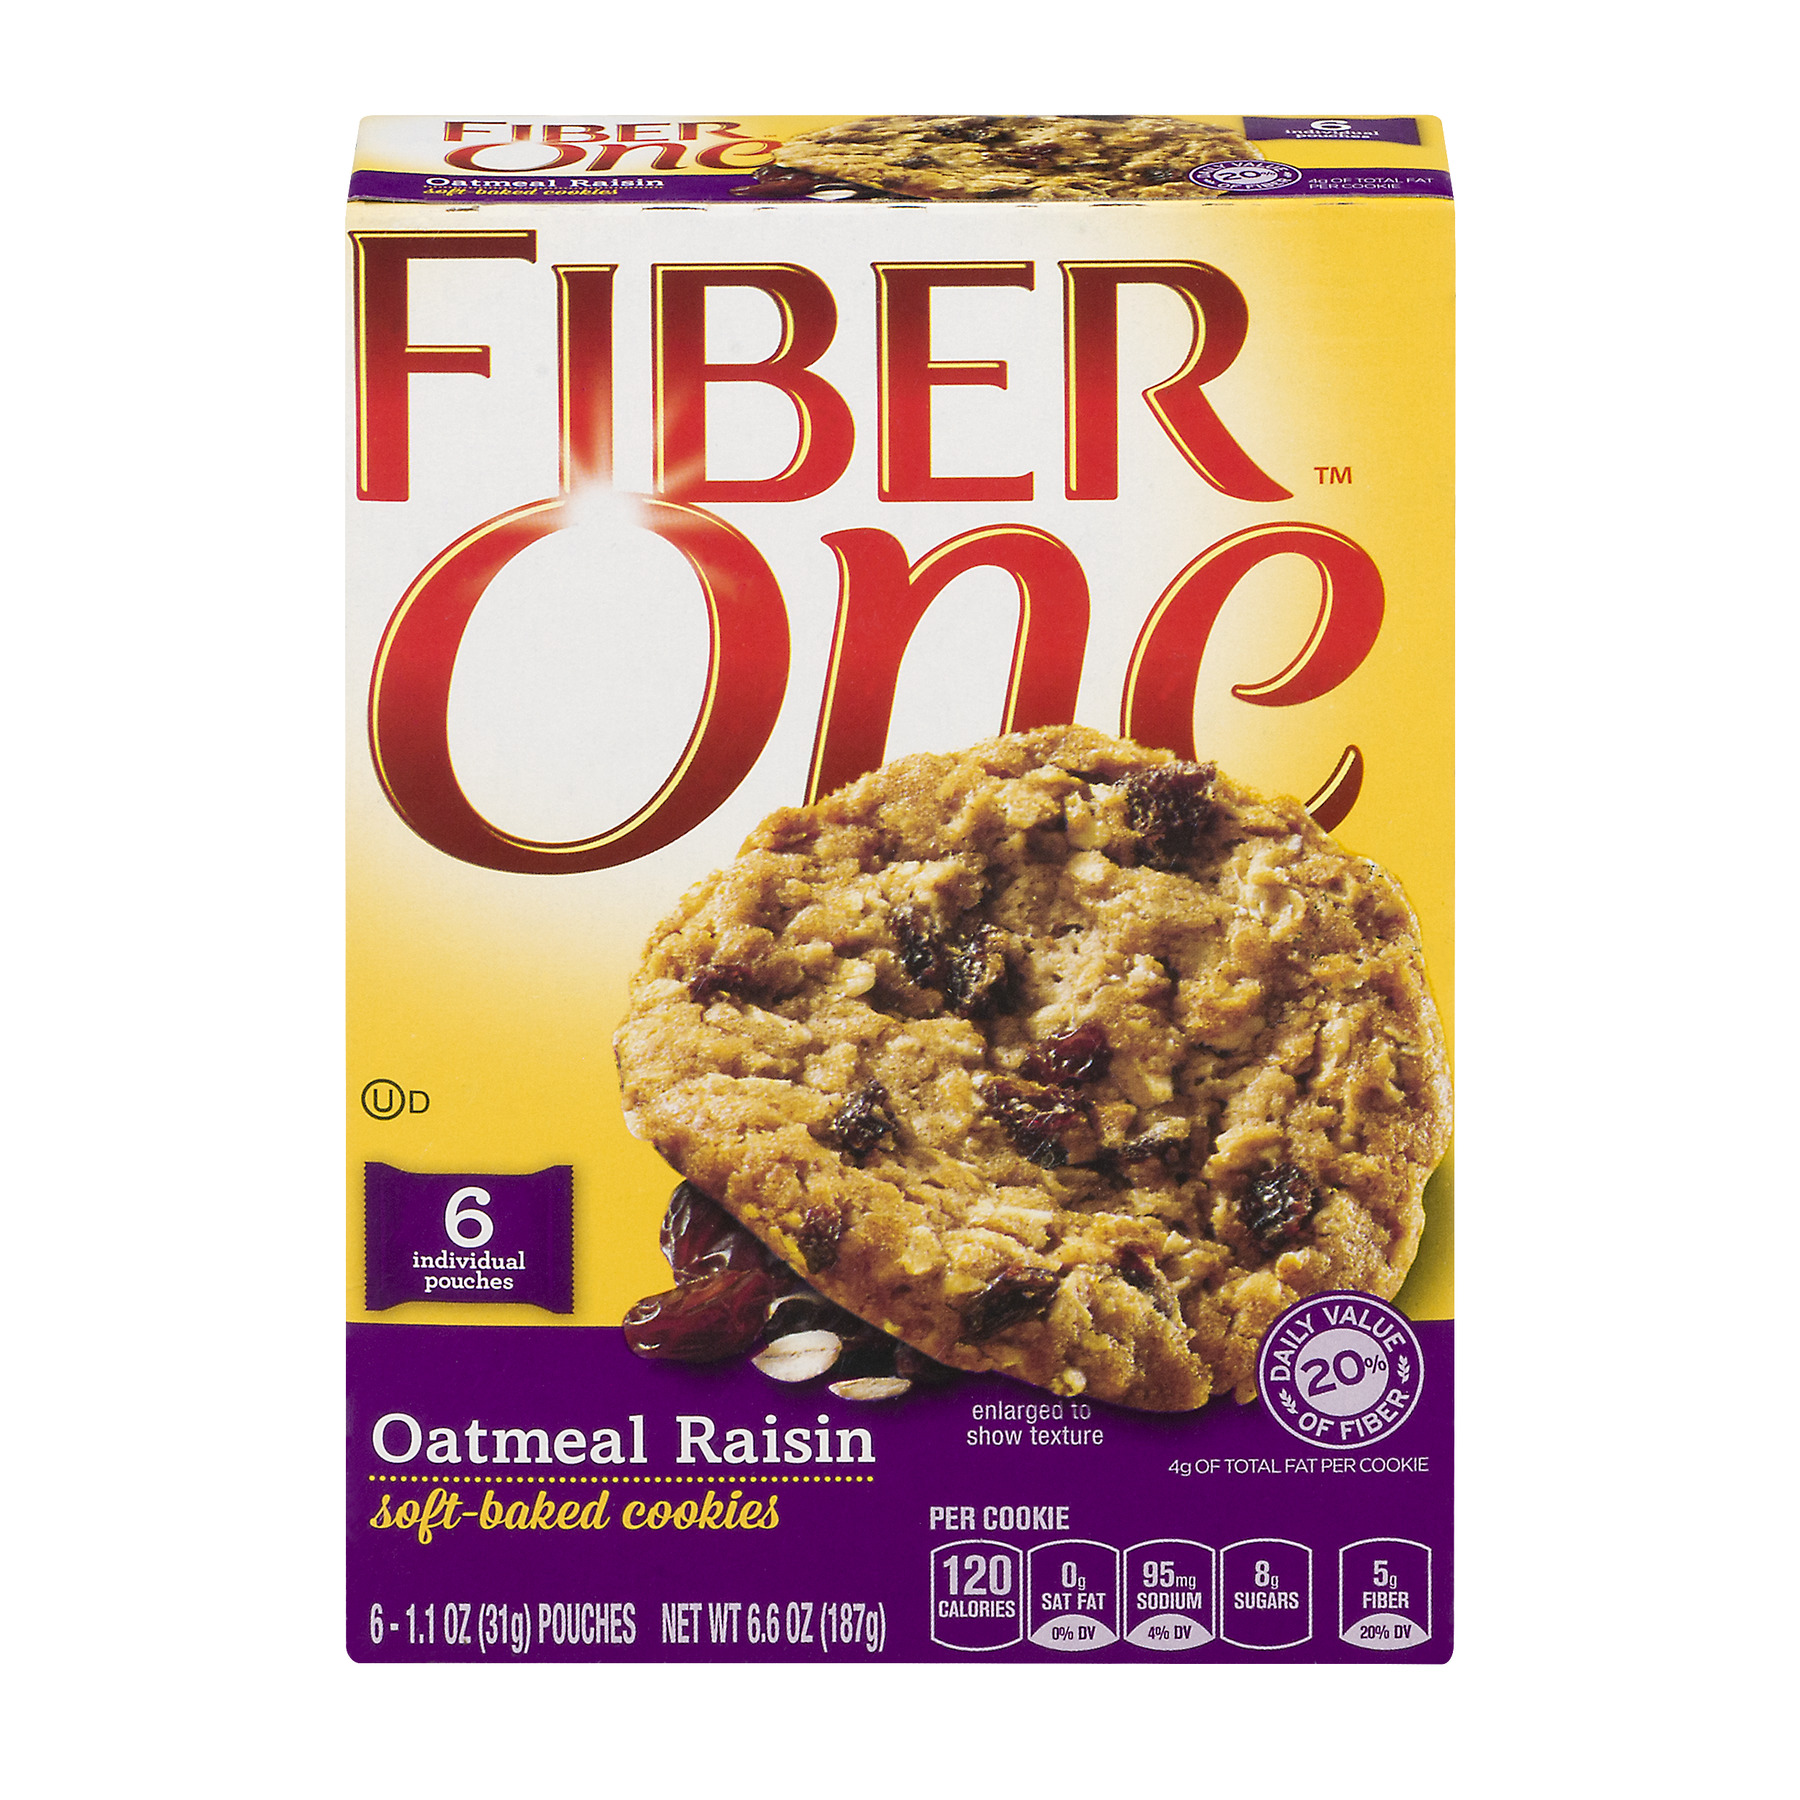 Fiber One™ Oatmeal Raisin Soft-Baked Cookies 6 ct Box, 1.1 OZ